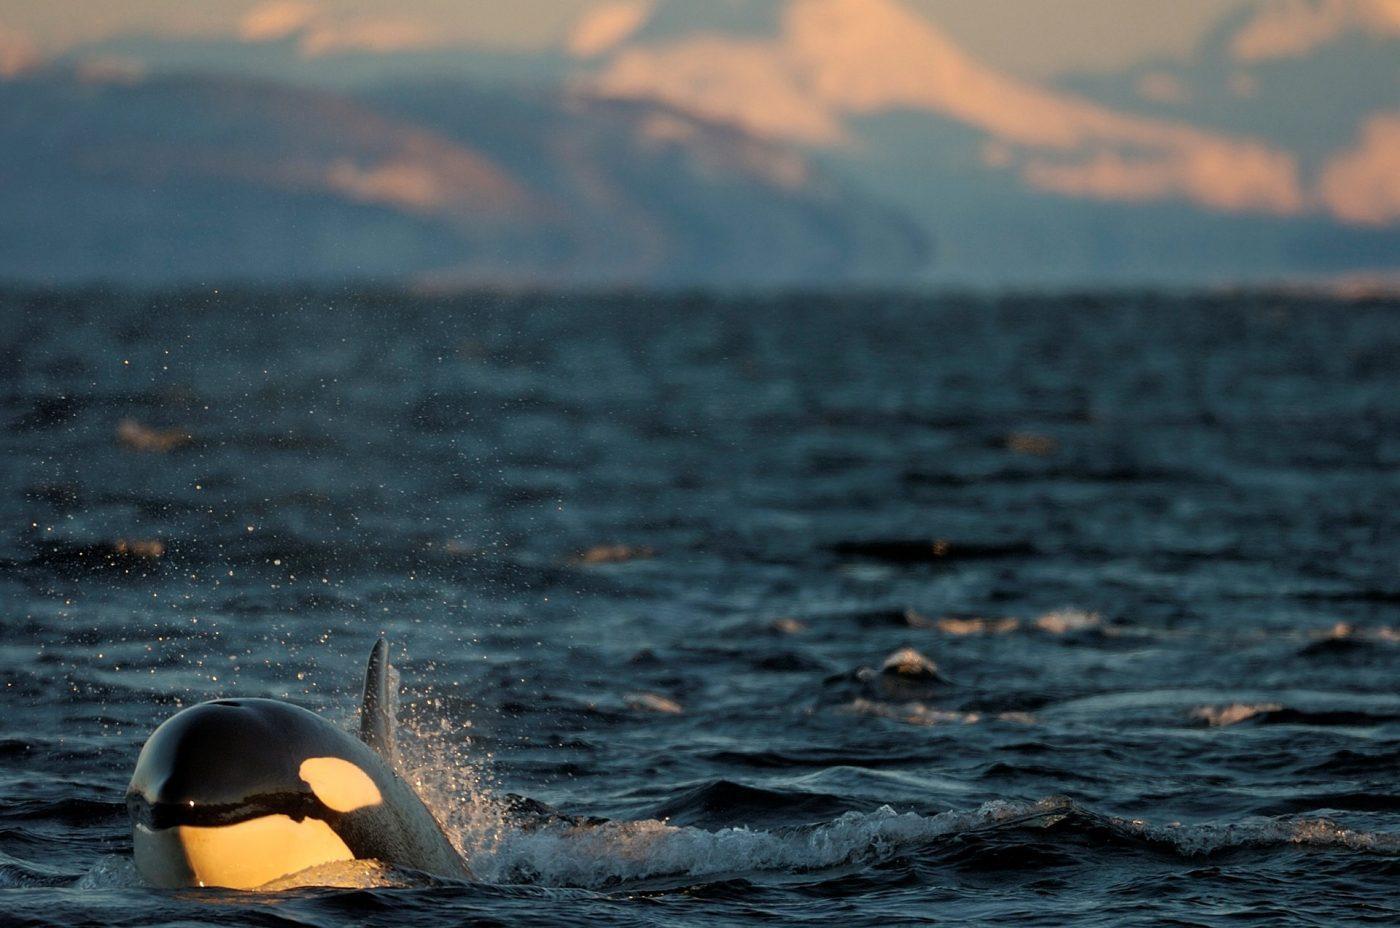 Killer whale. Photo by Magnus Elander.